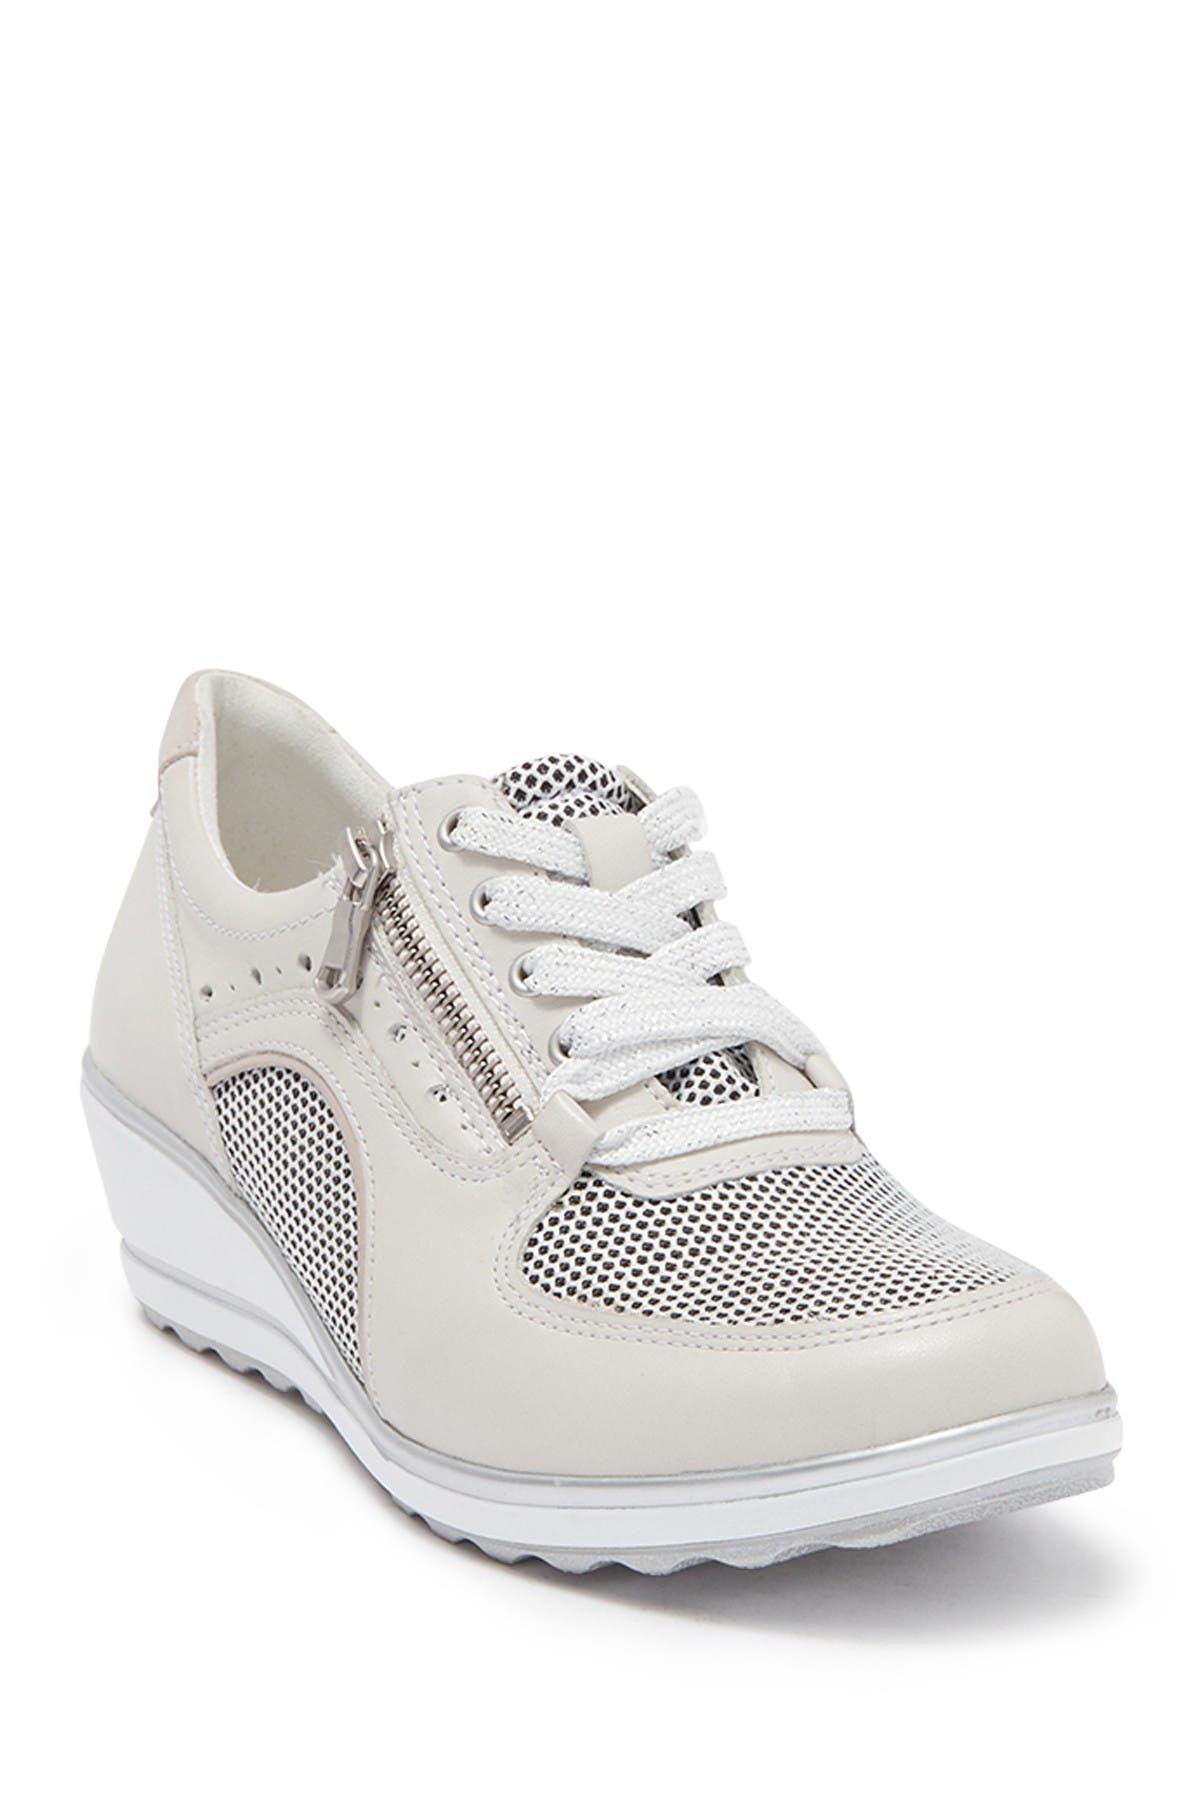 Image of Romika Kingston 01 Wedge Sneaker